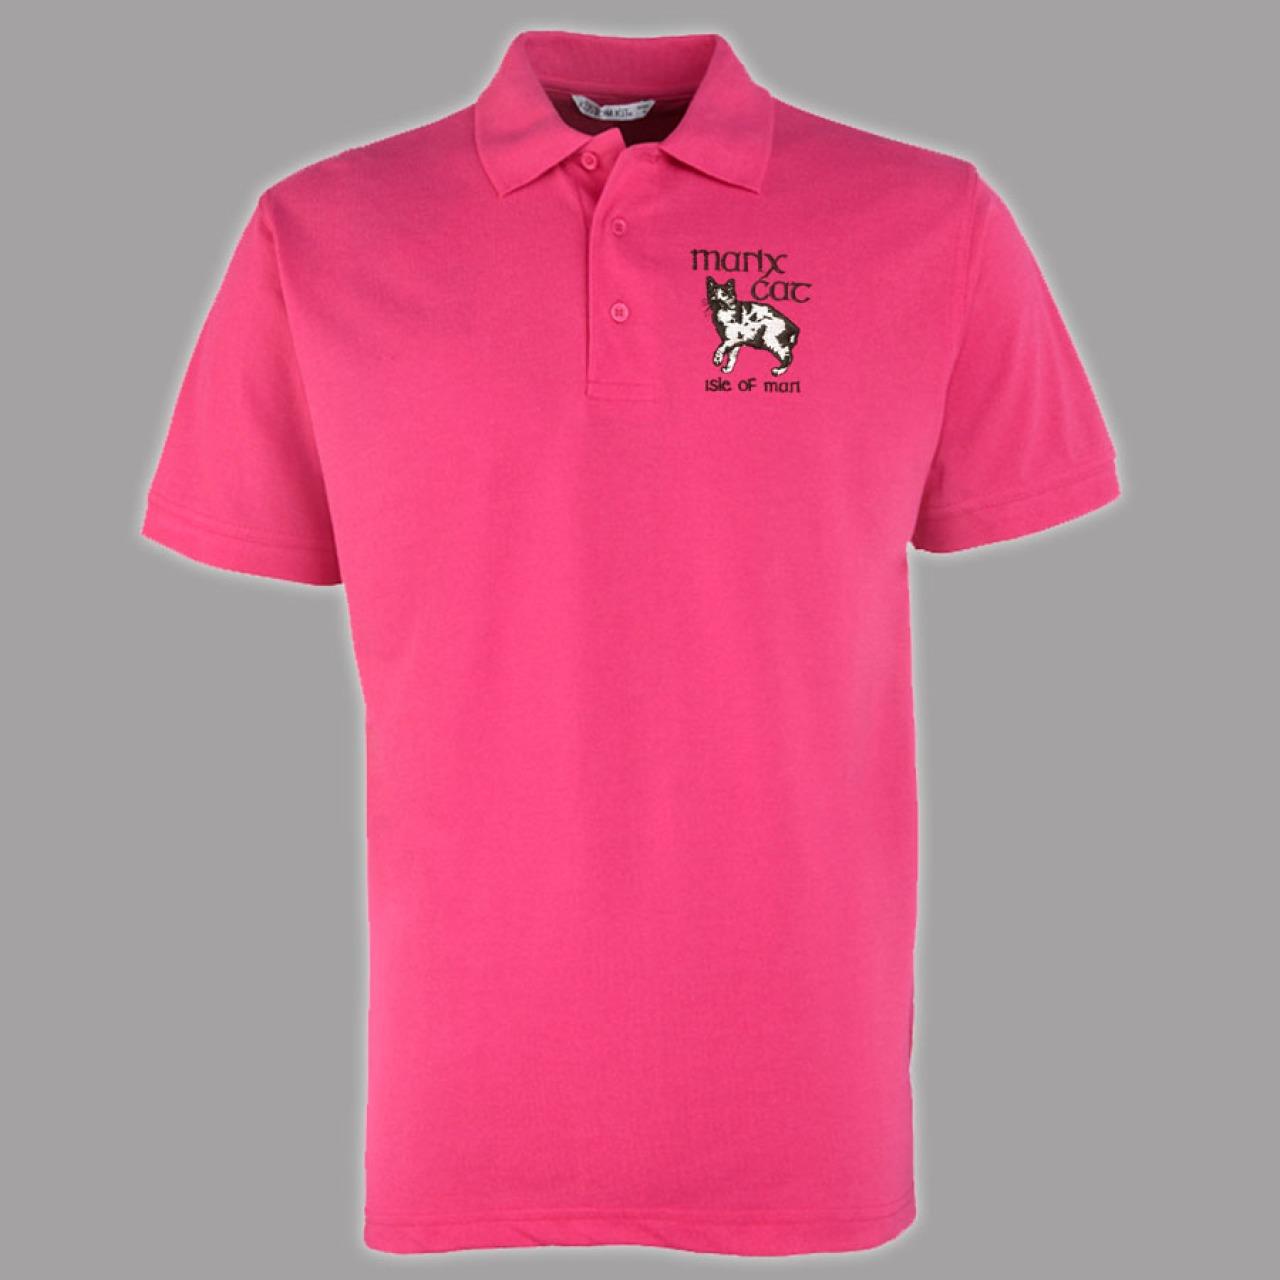 Quality hot pink manx polo shirt manx cat logo mep 180 for Quality polo shirts with company logo